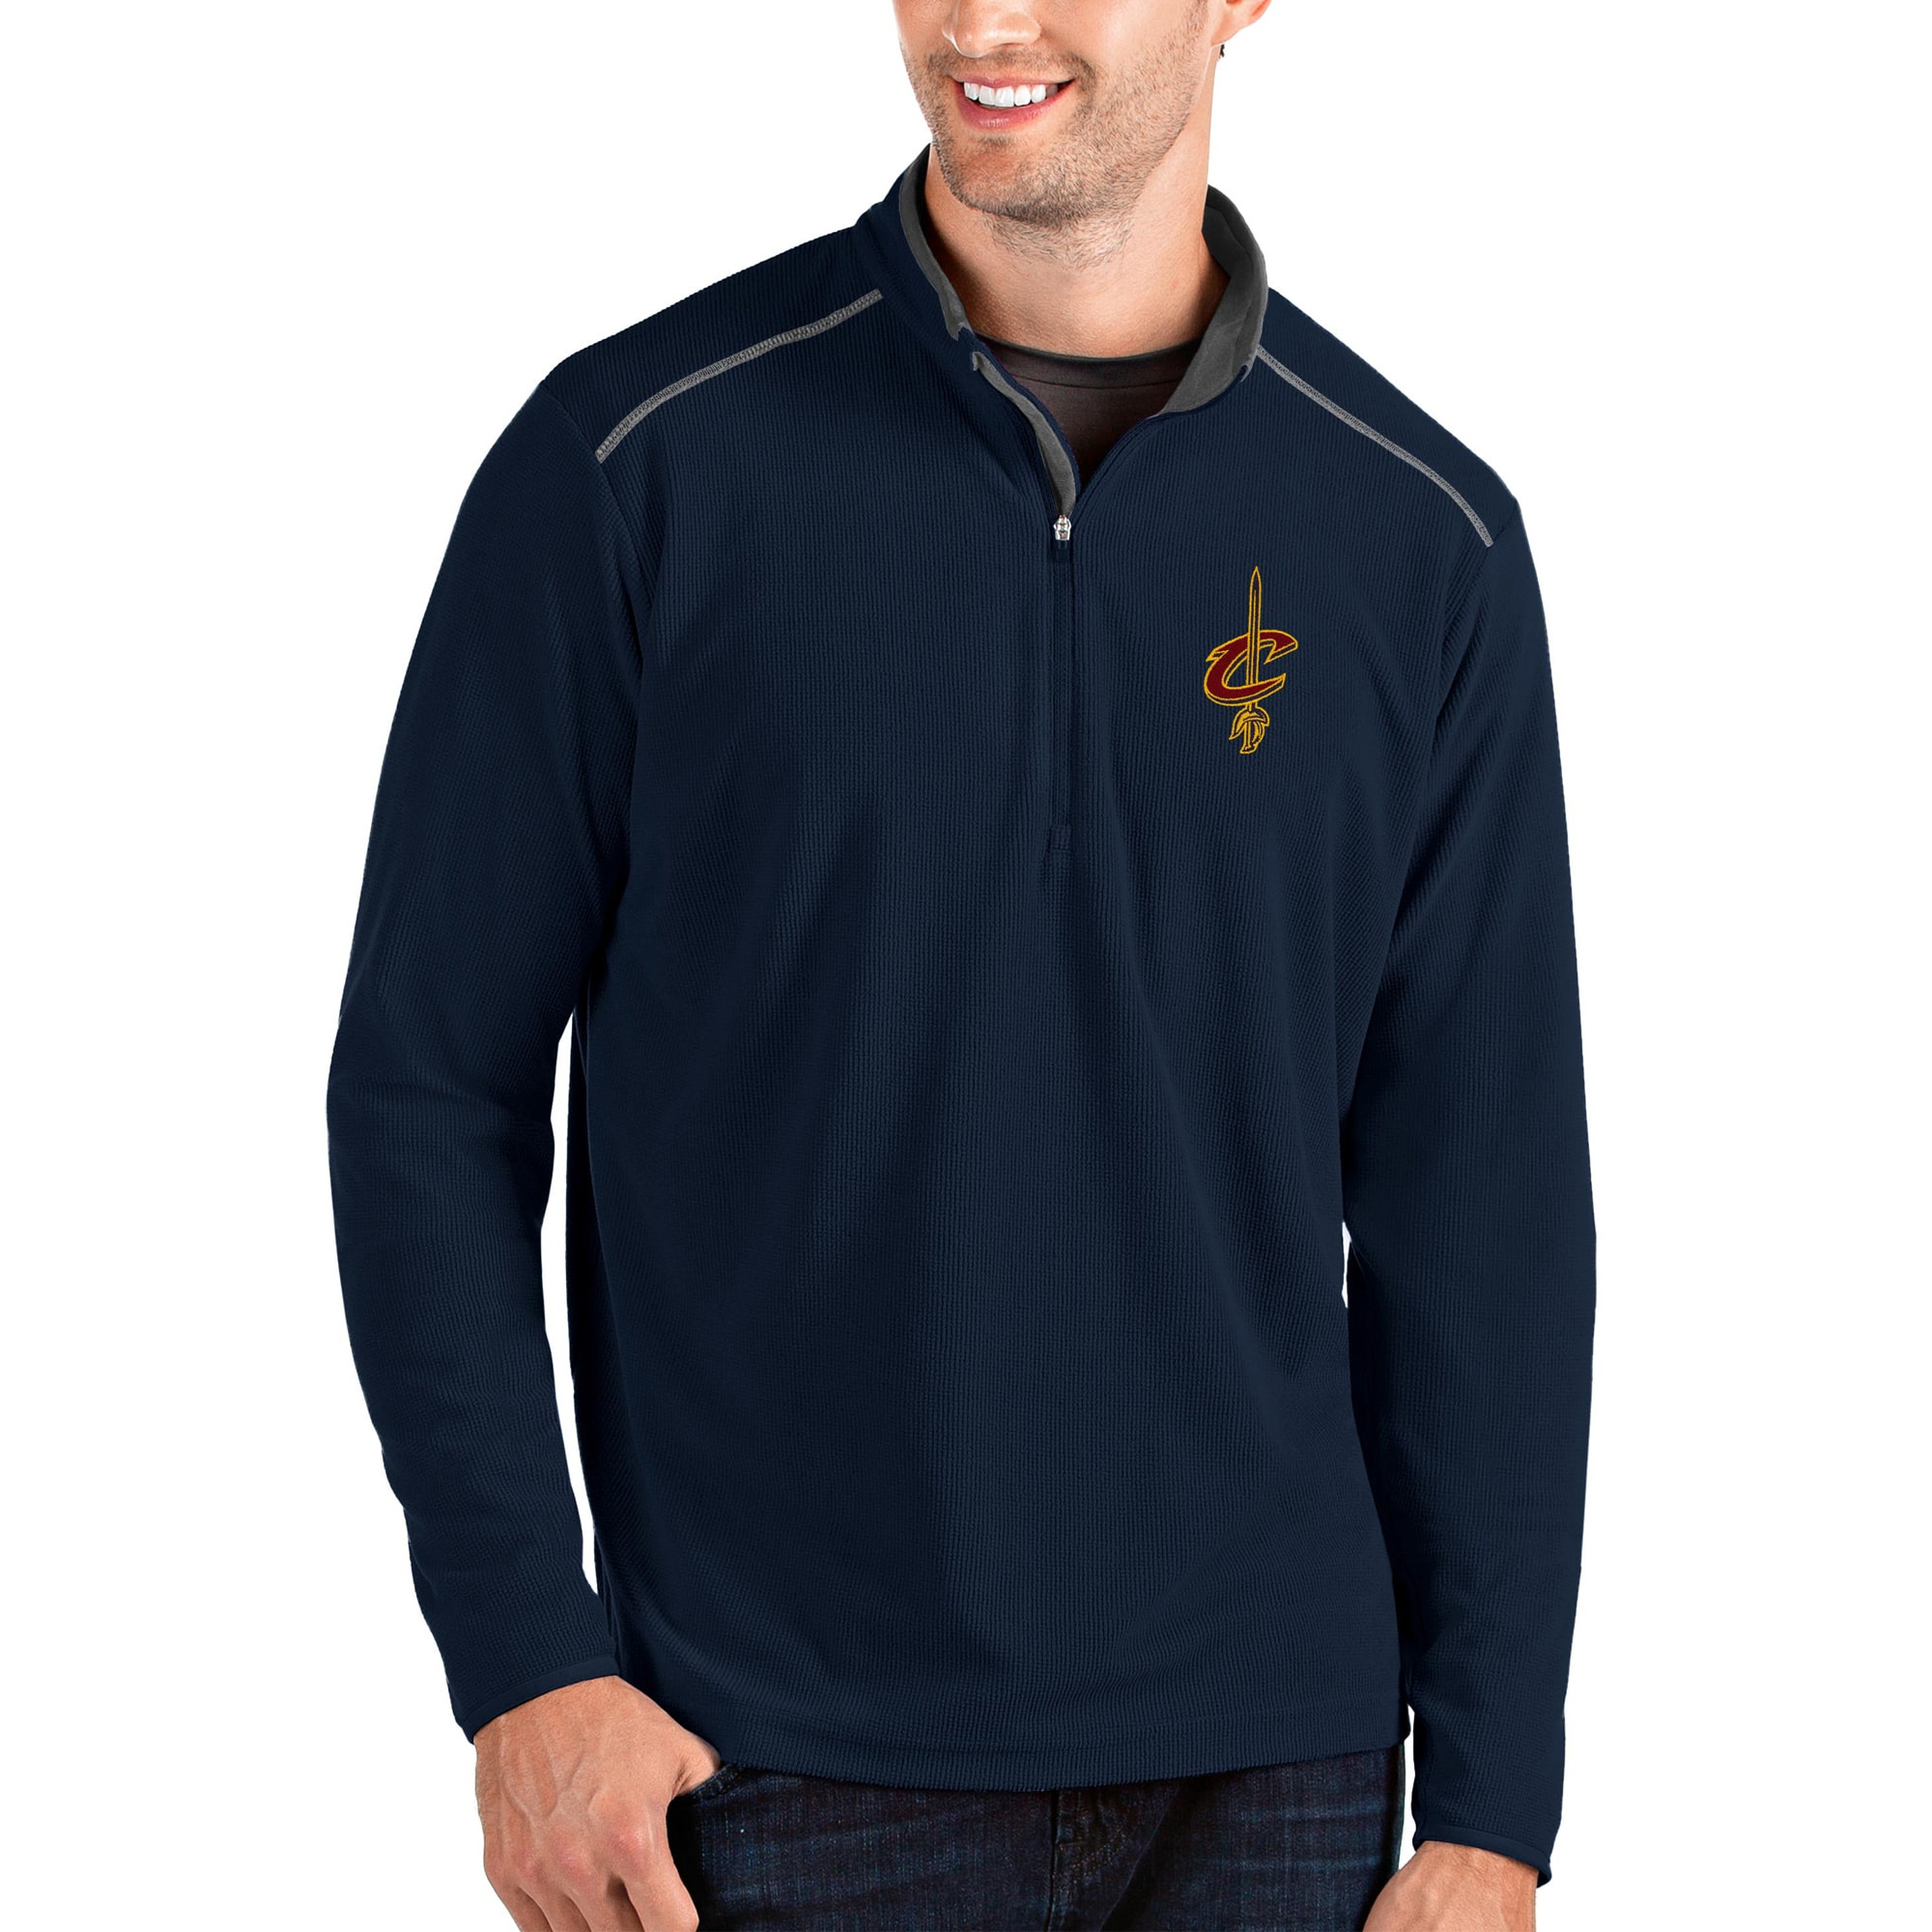 Cleveland Cavaliers Antigua Glacier Quarter-Zip Pullover Jacket - Navy/Gray